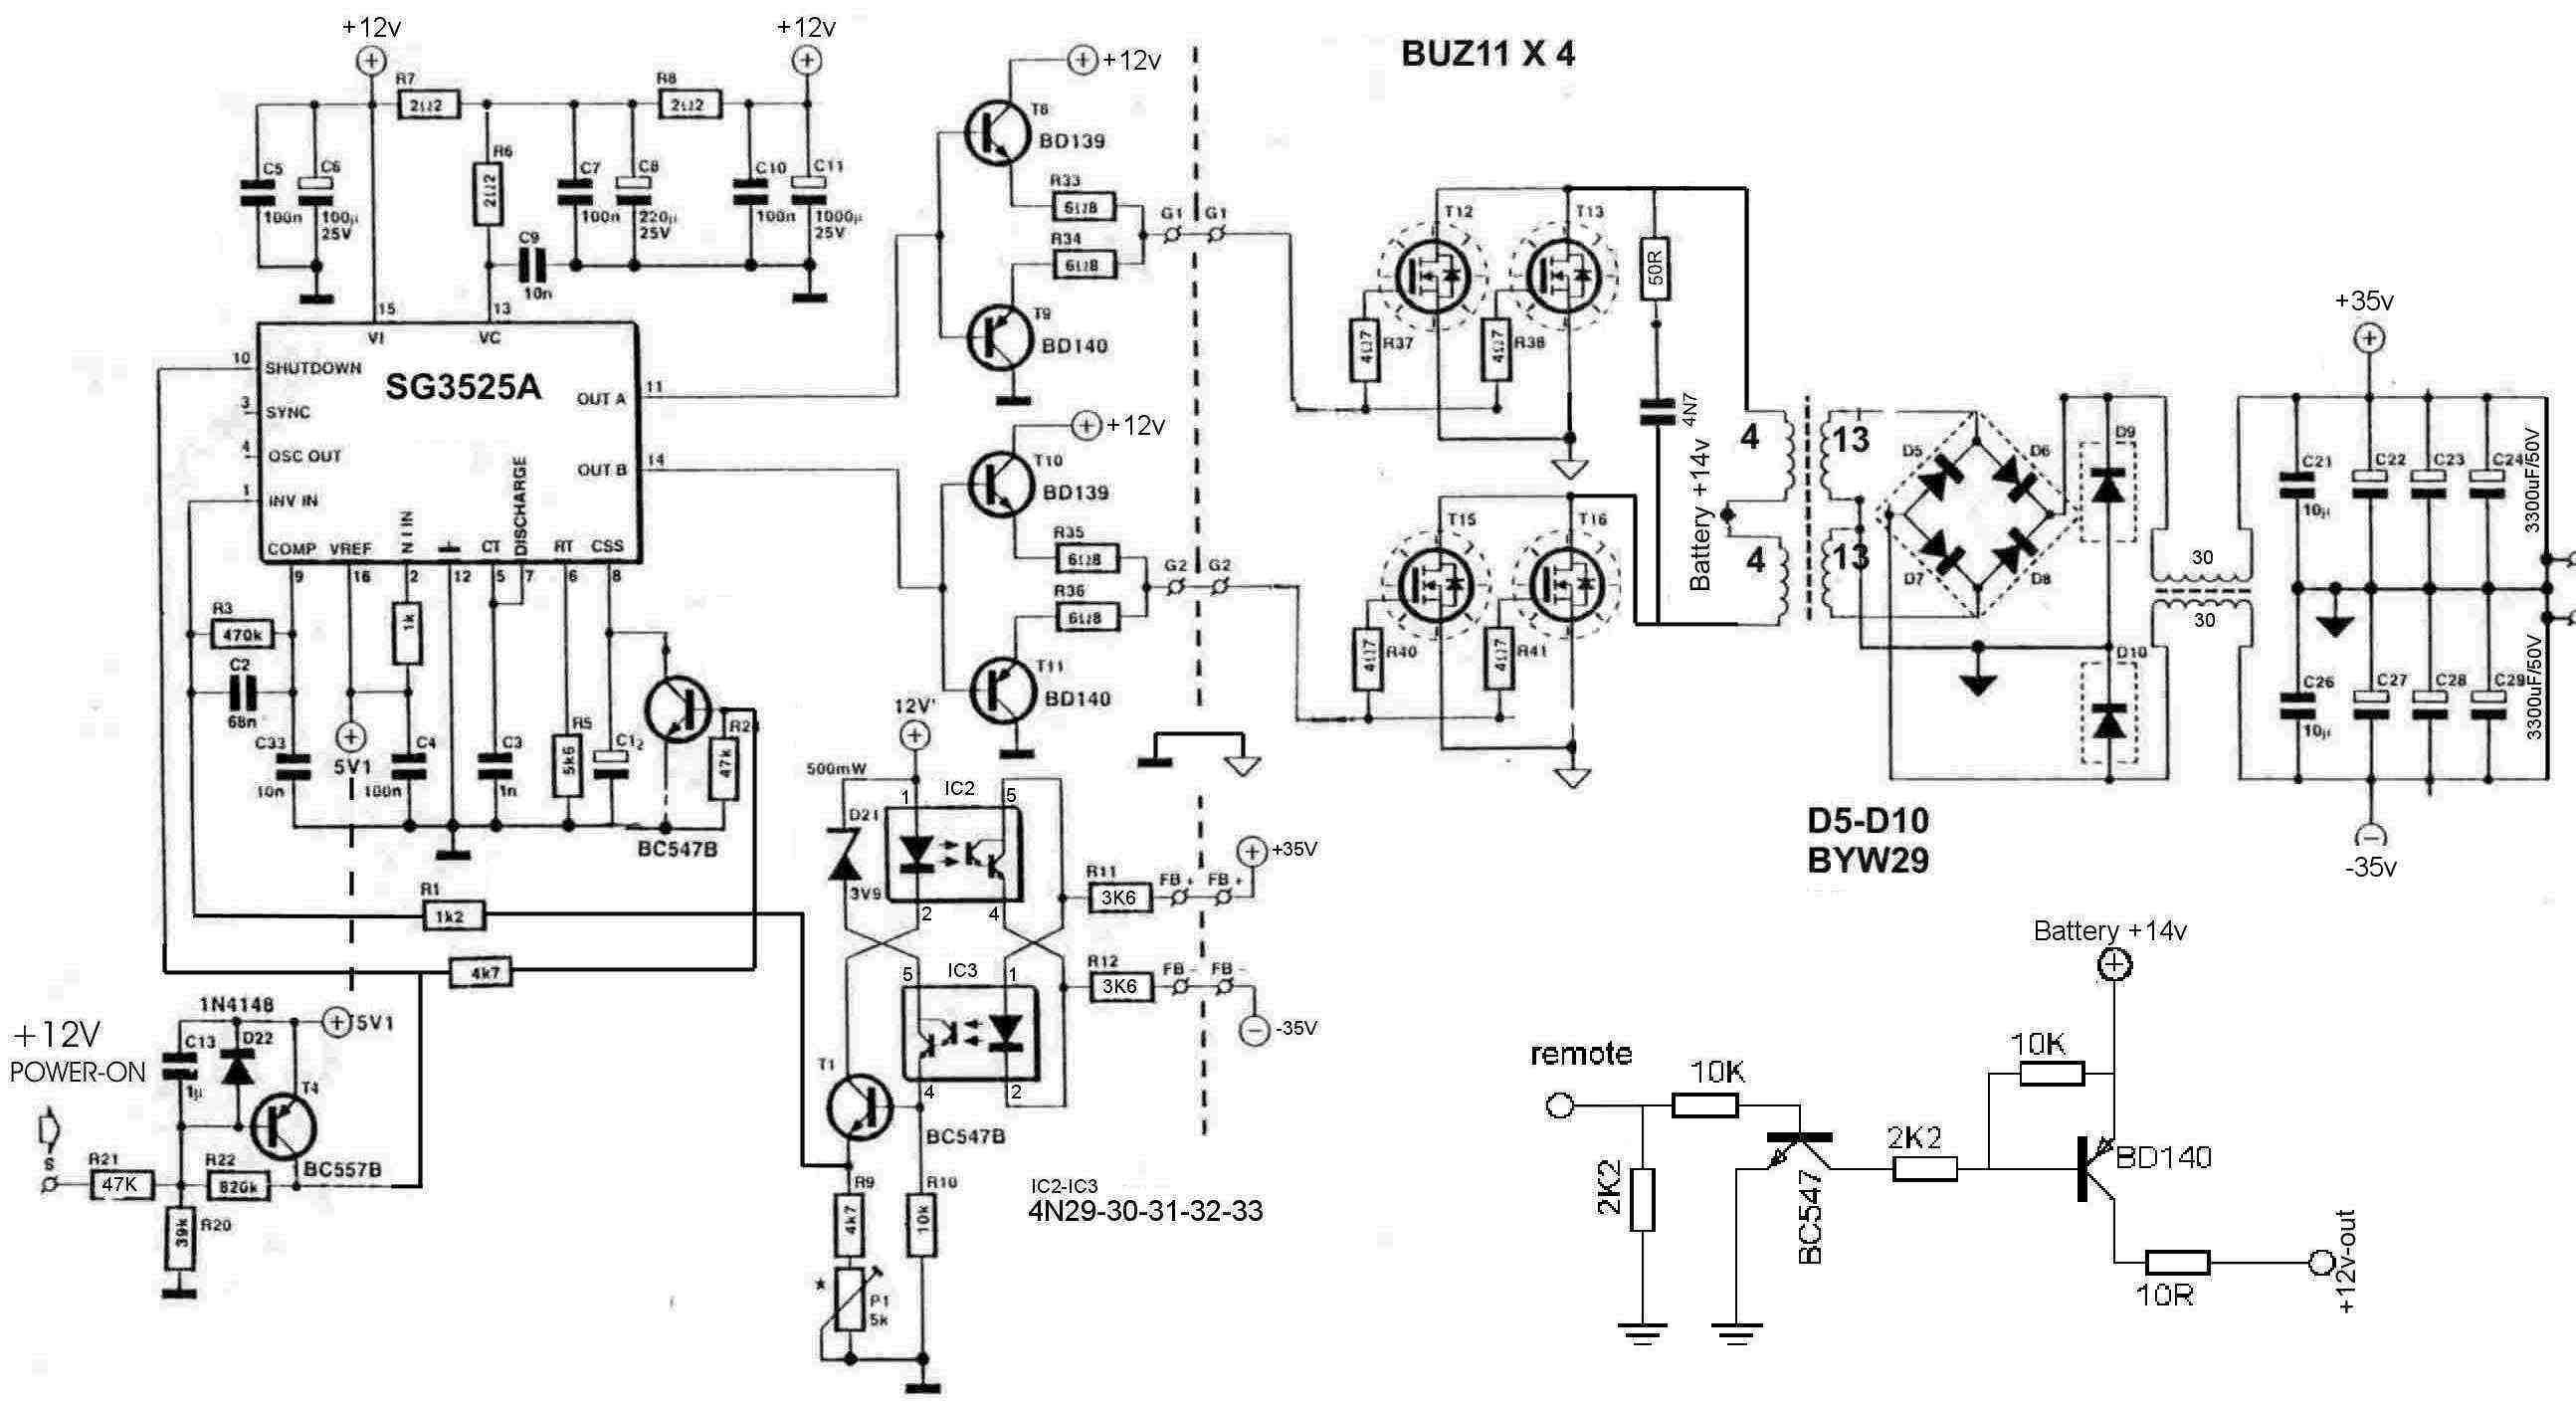 Leggere Schemi Elettrici : Regole schemi tom s hardware italia